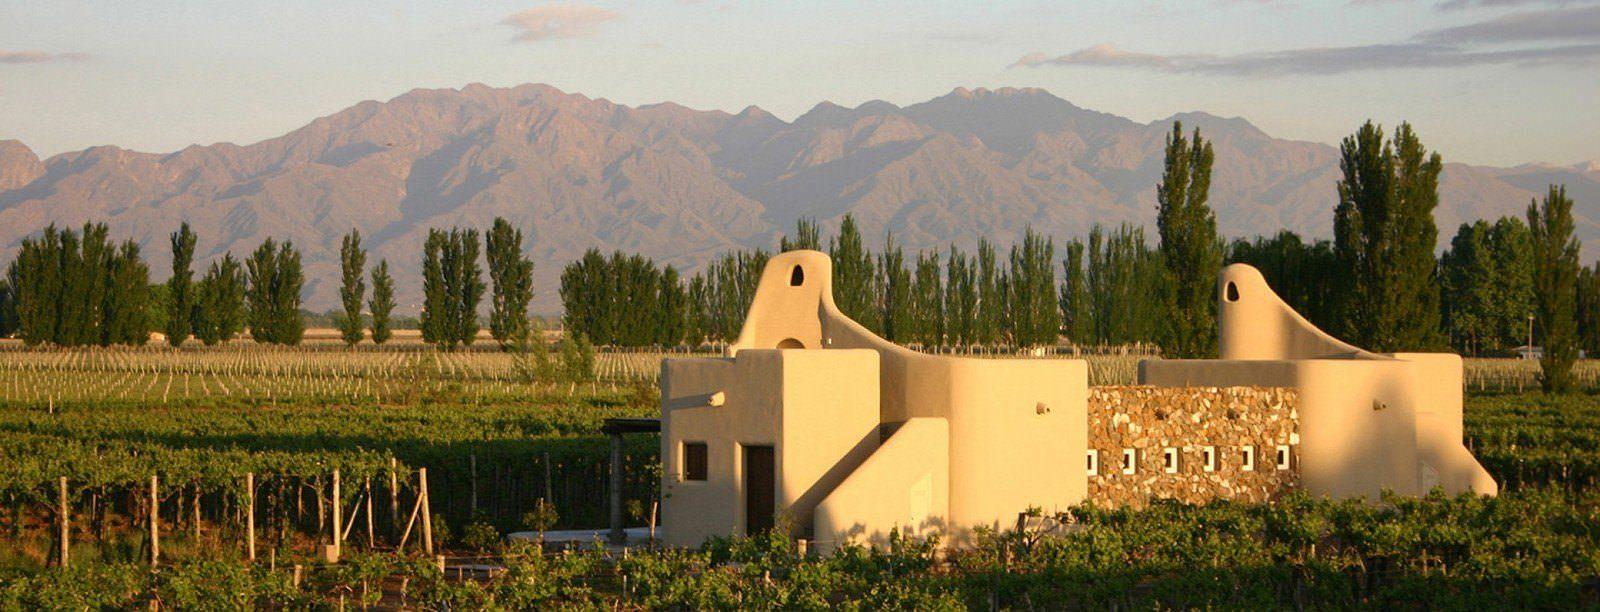 ultimate list of best luxury hotels in argentina mendoza cavas wine lodge